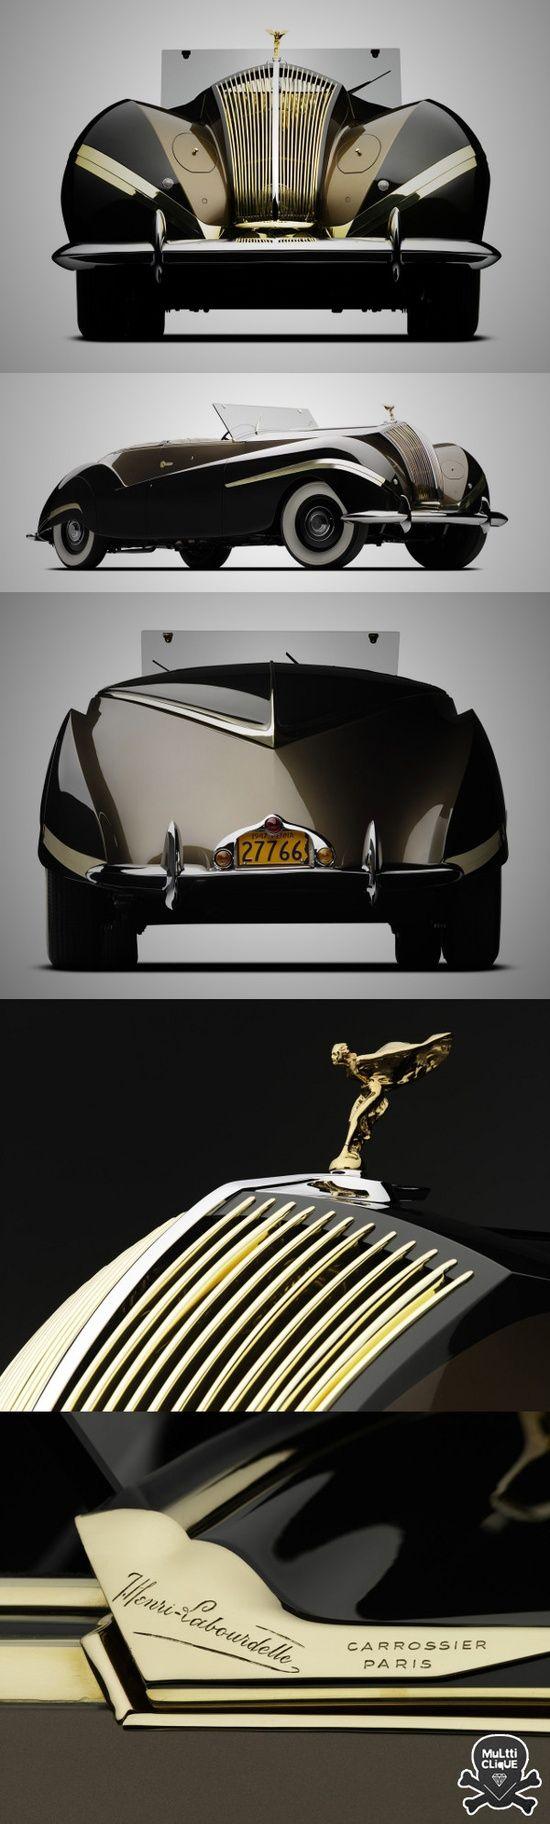 Rolls Royce #automobile #car #luxury #wheels